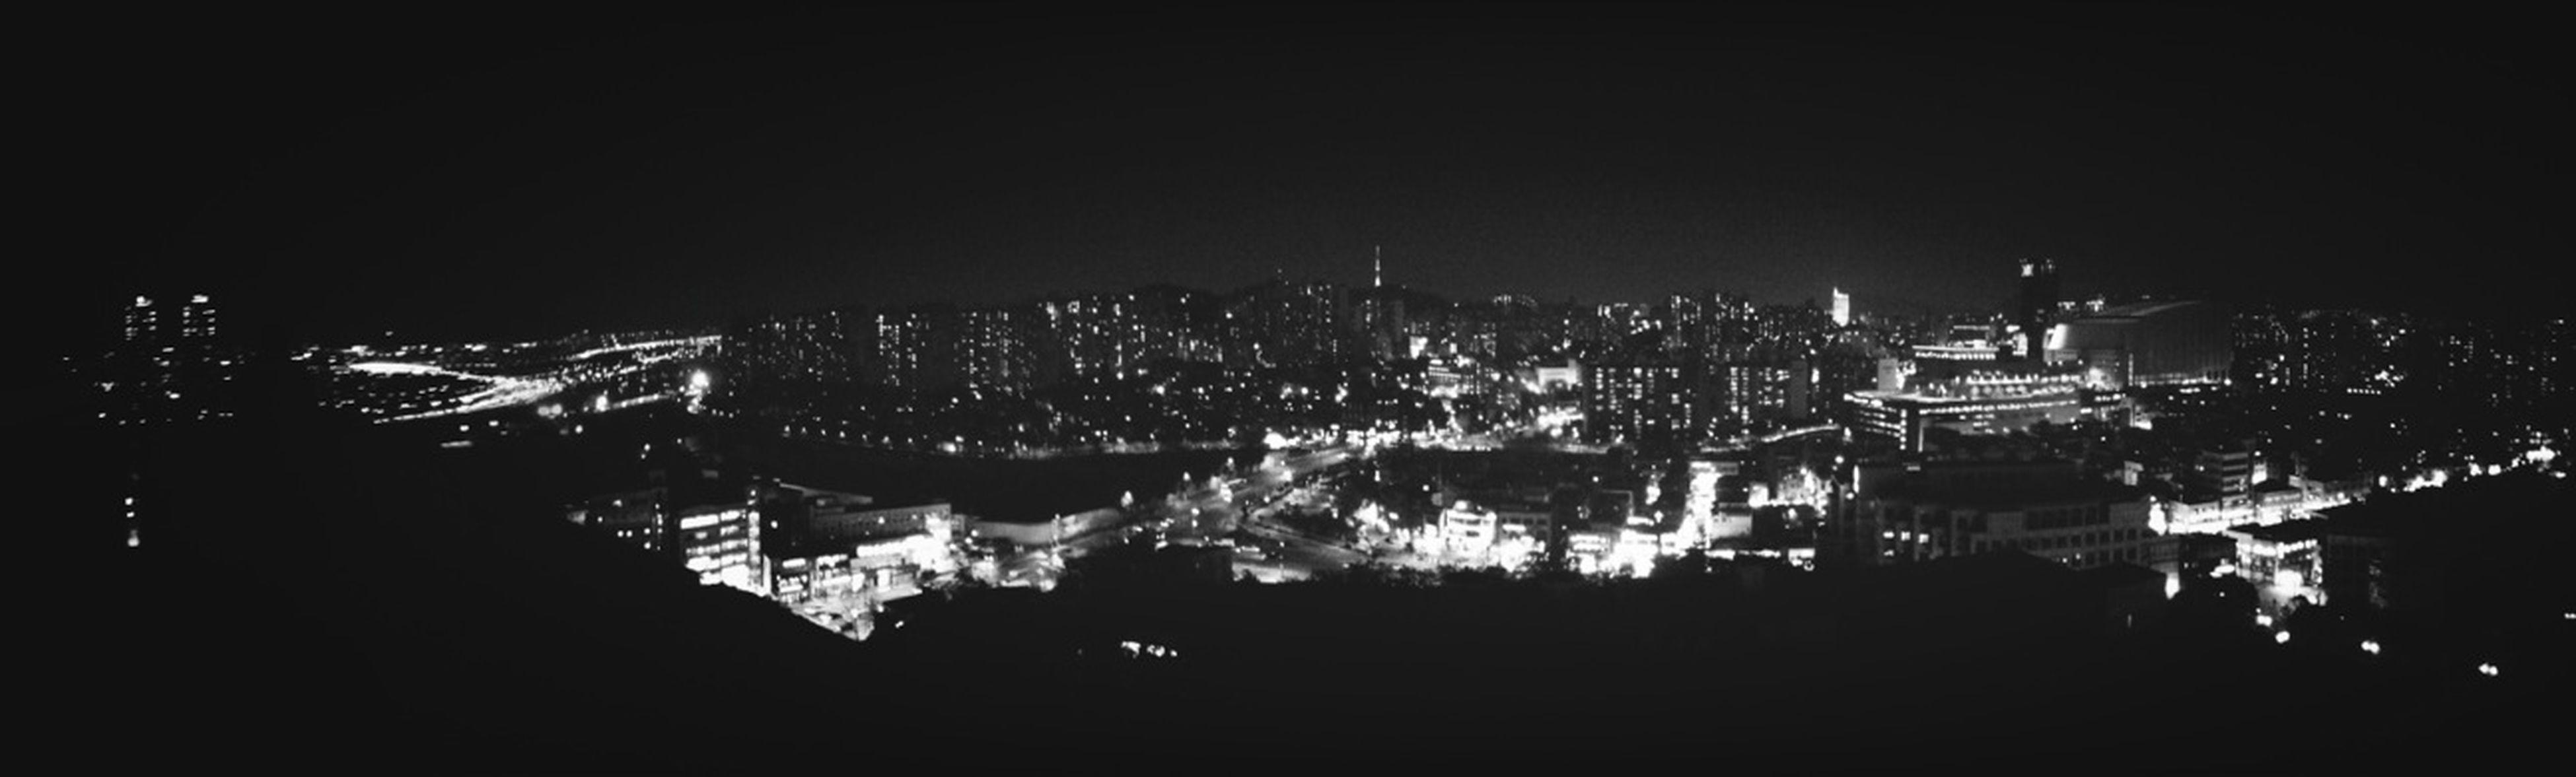 City Taking Photos Night Lights Panorama